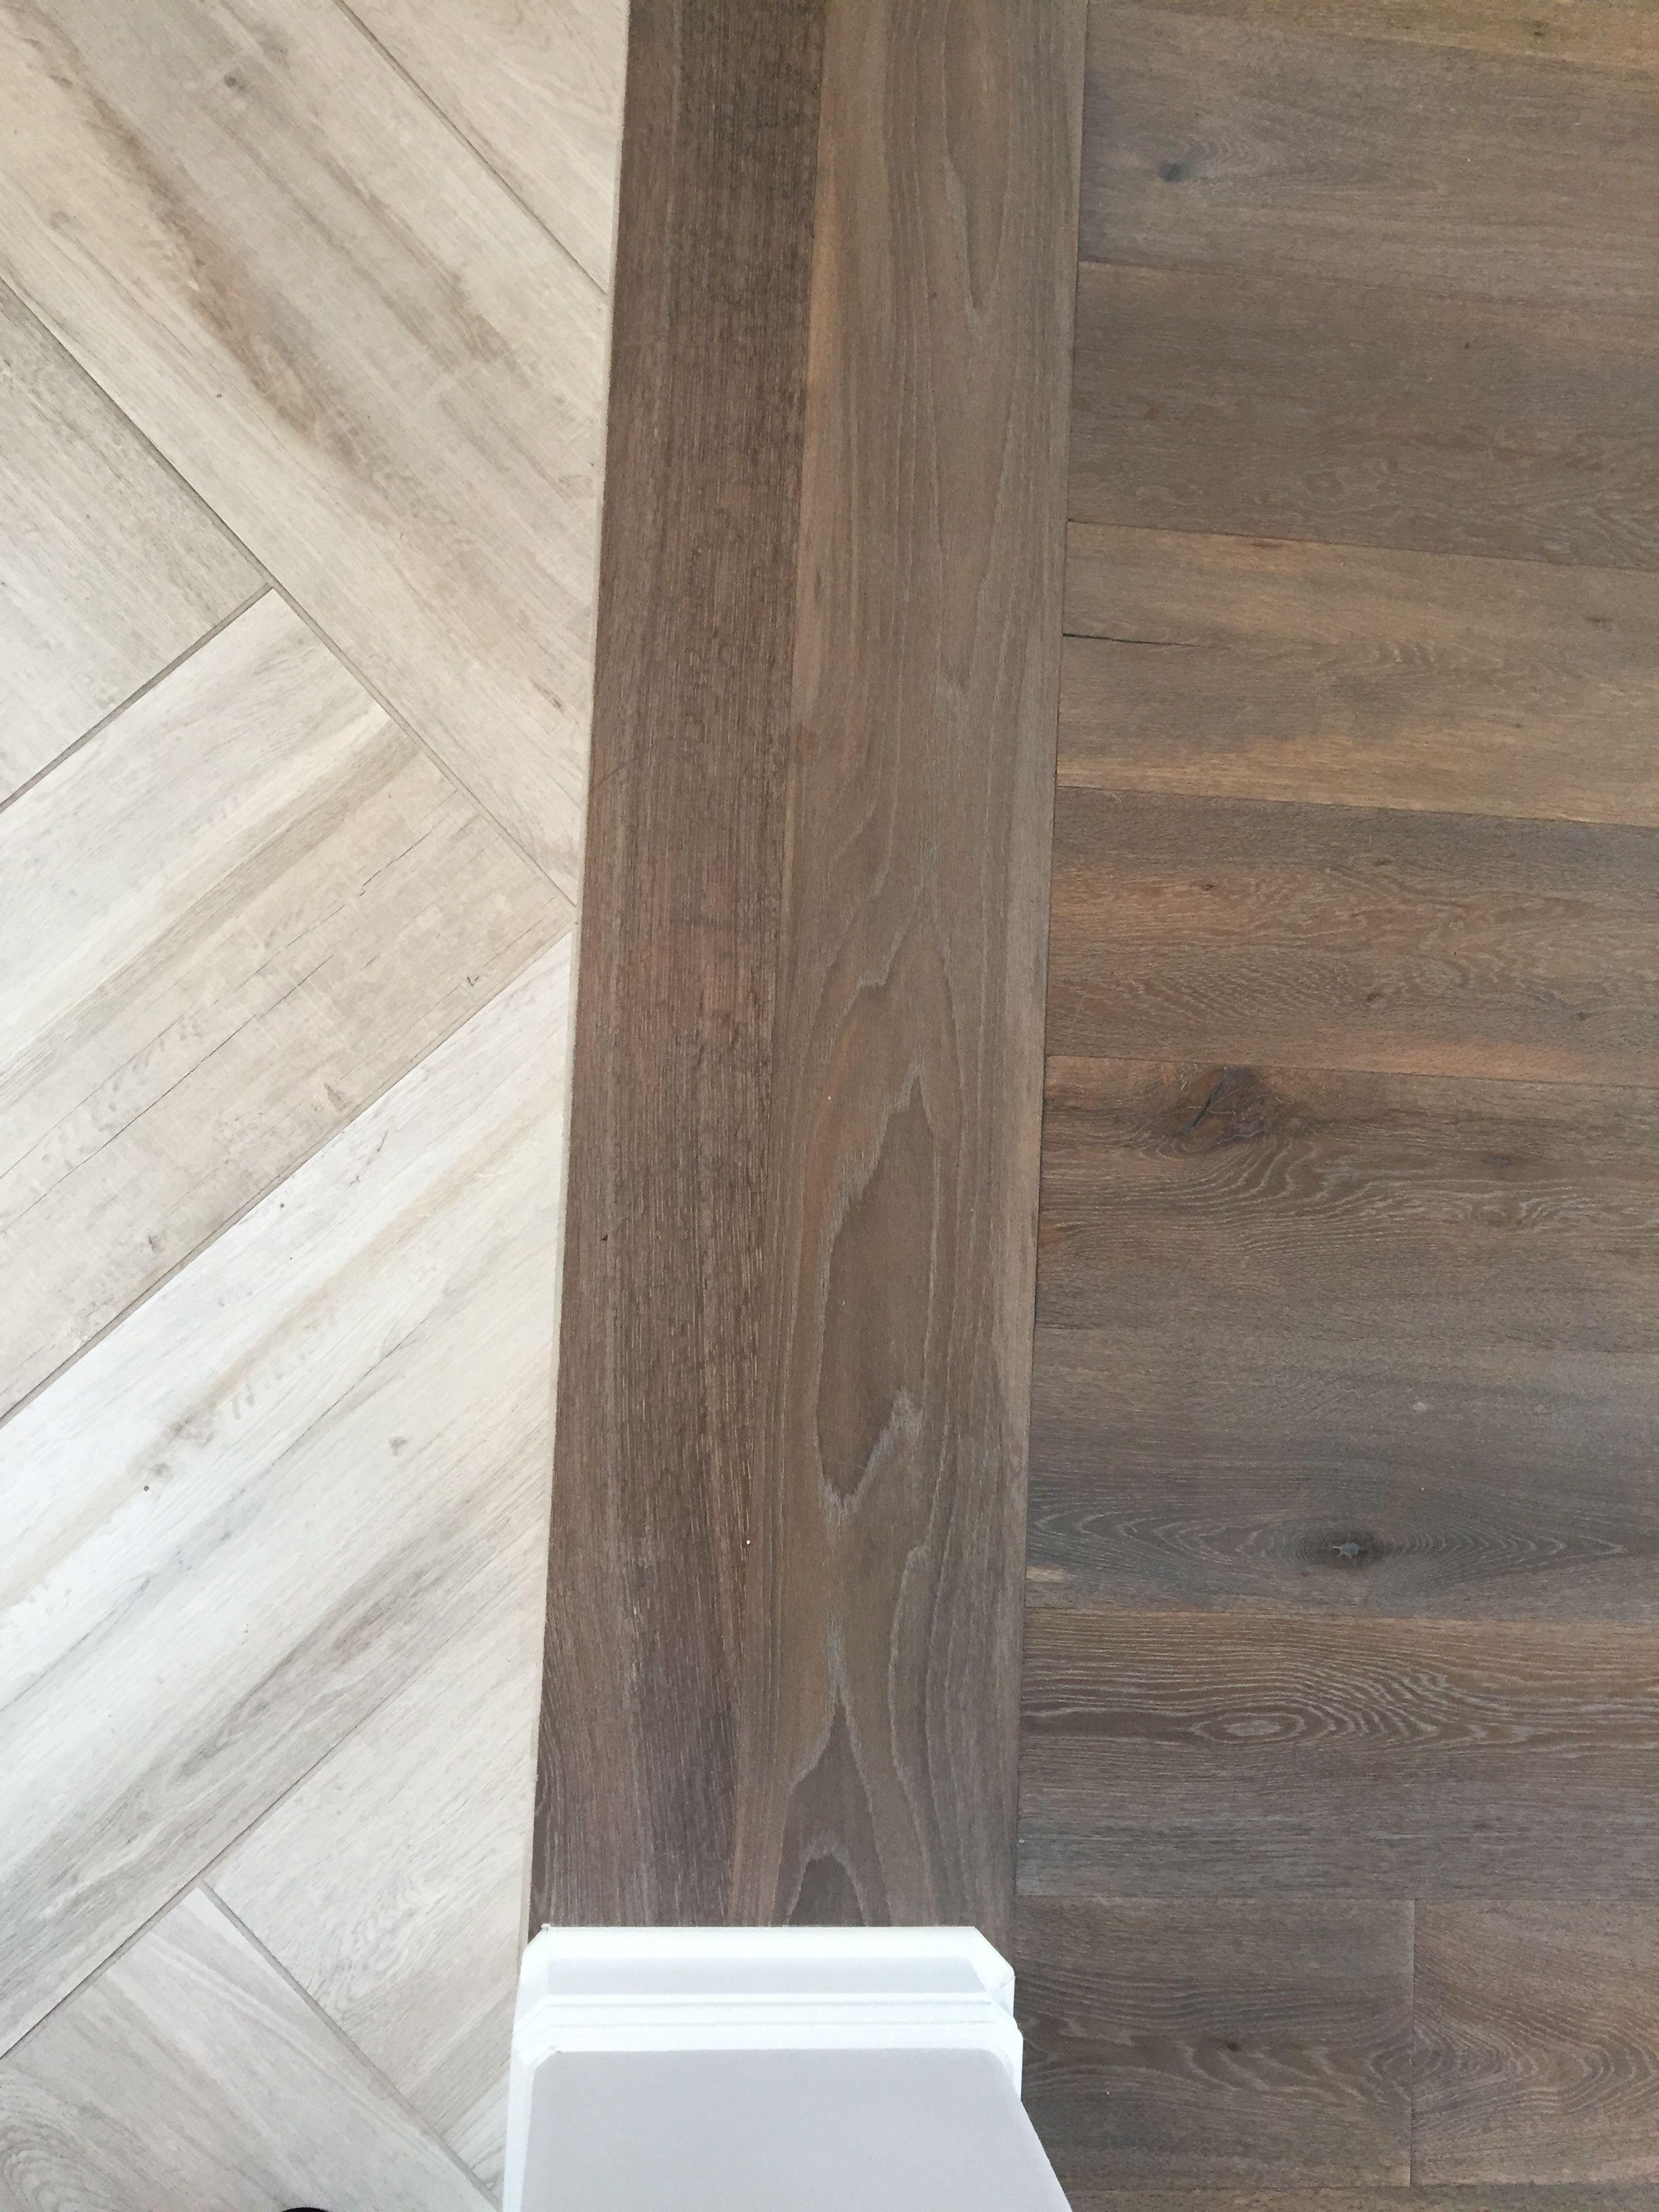 hardwood floor manufacturers near me of floor transition laminate to herringbone tile pattern model in floor transition laminate to herringbone tile pattern